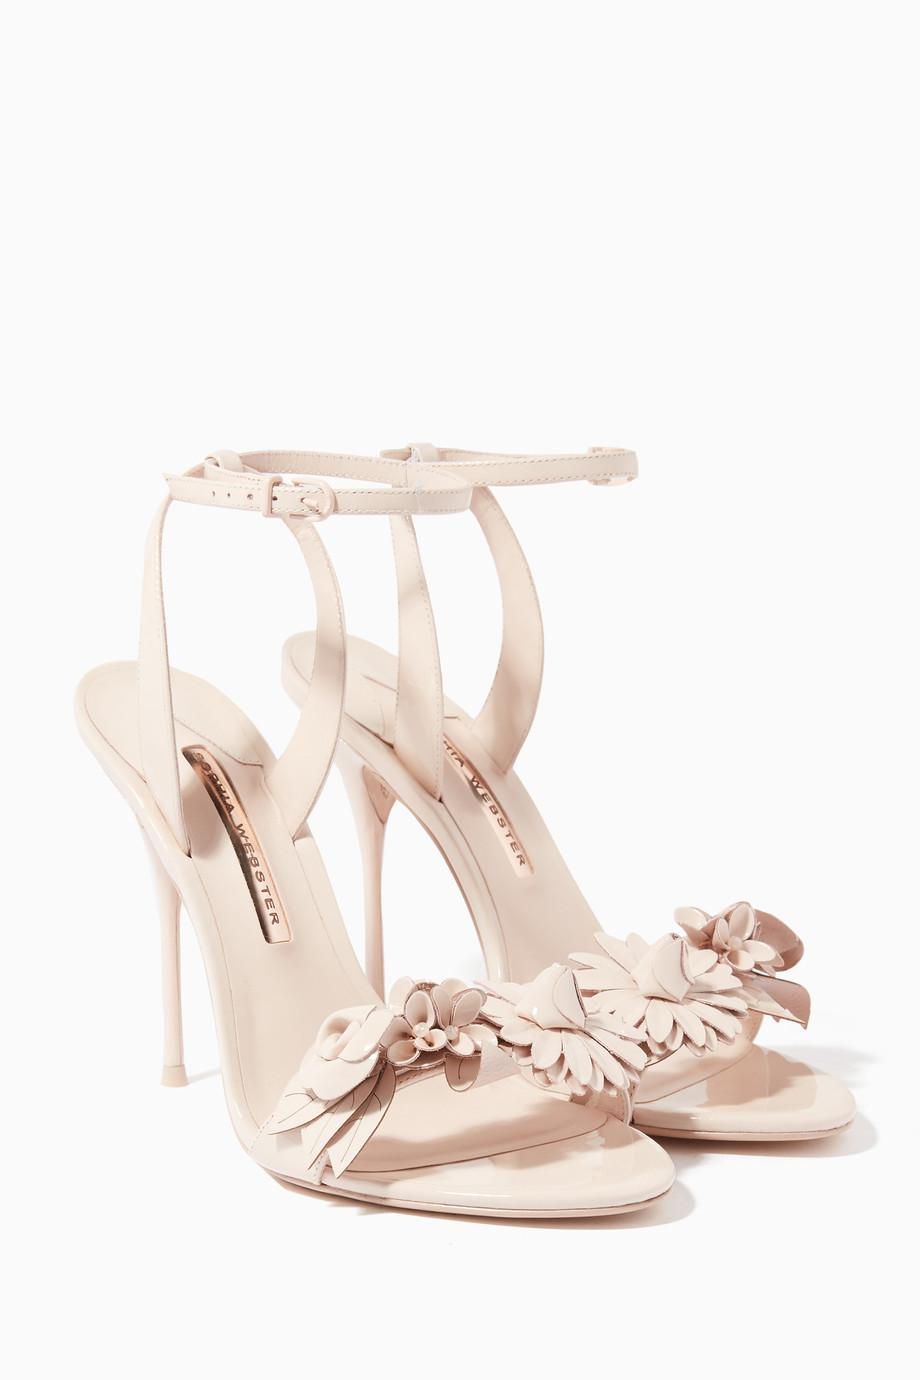 457a91d70914 Shop Sophia Webster Neutral Light-Beige Lilico Leather Sandals for Women